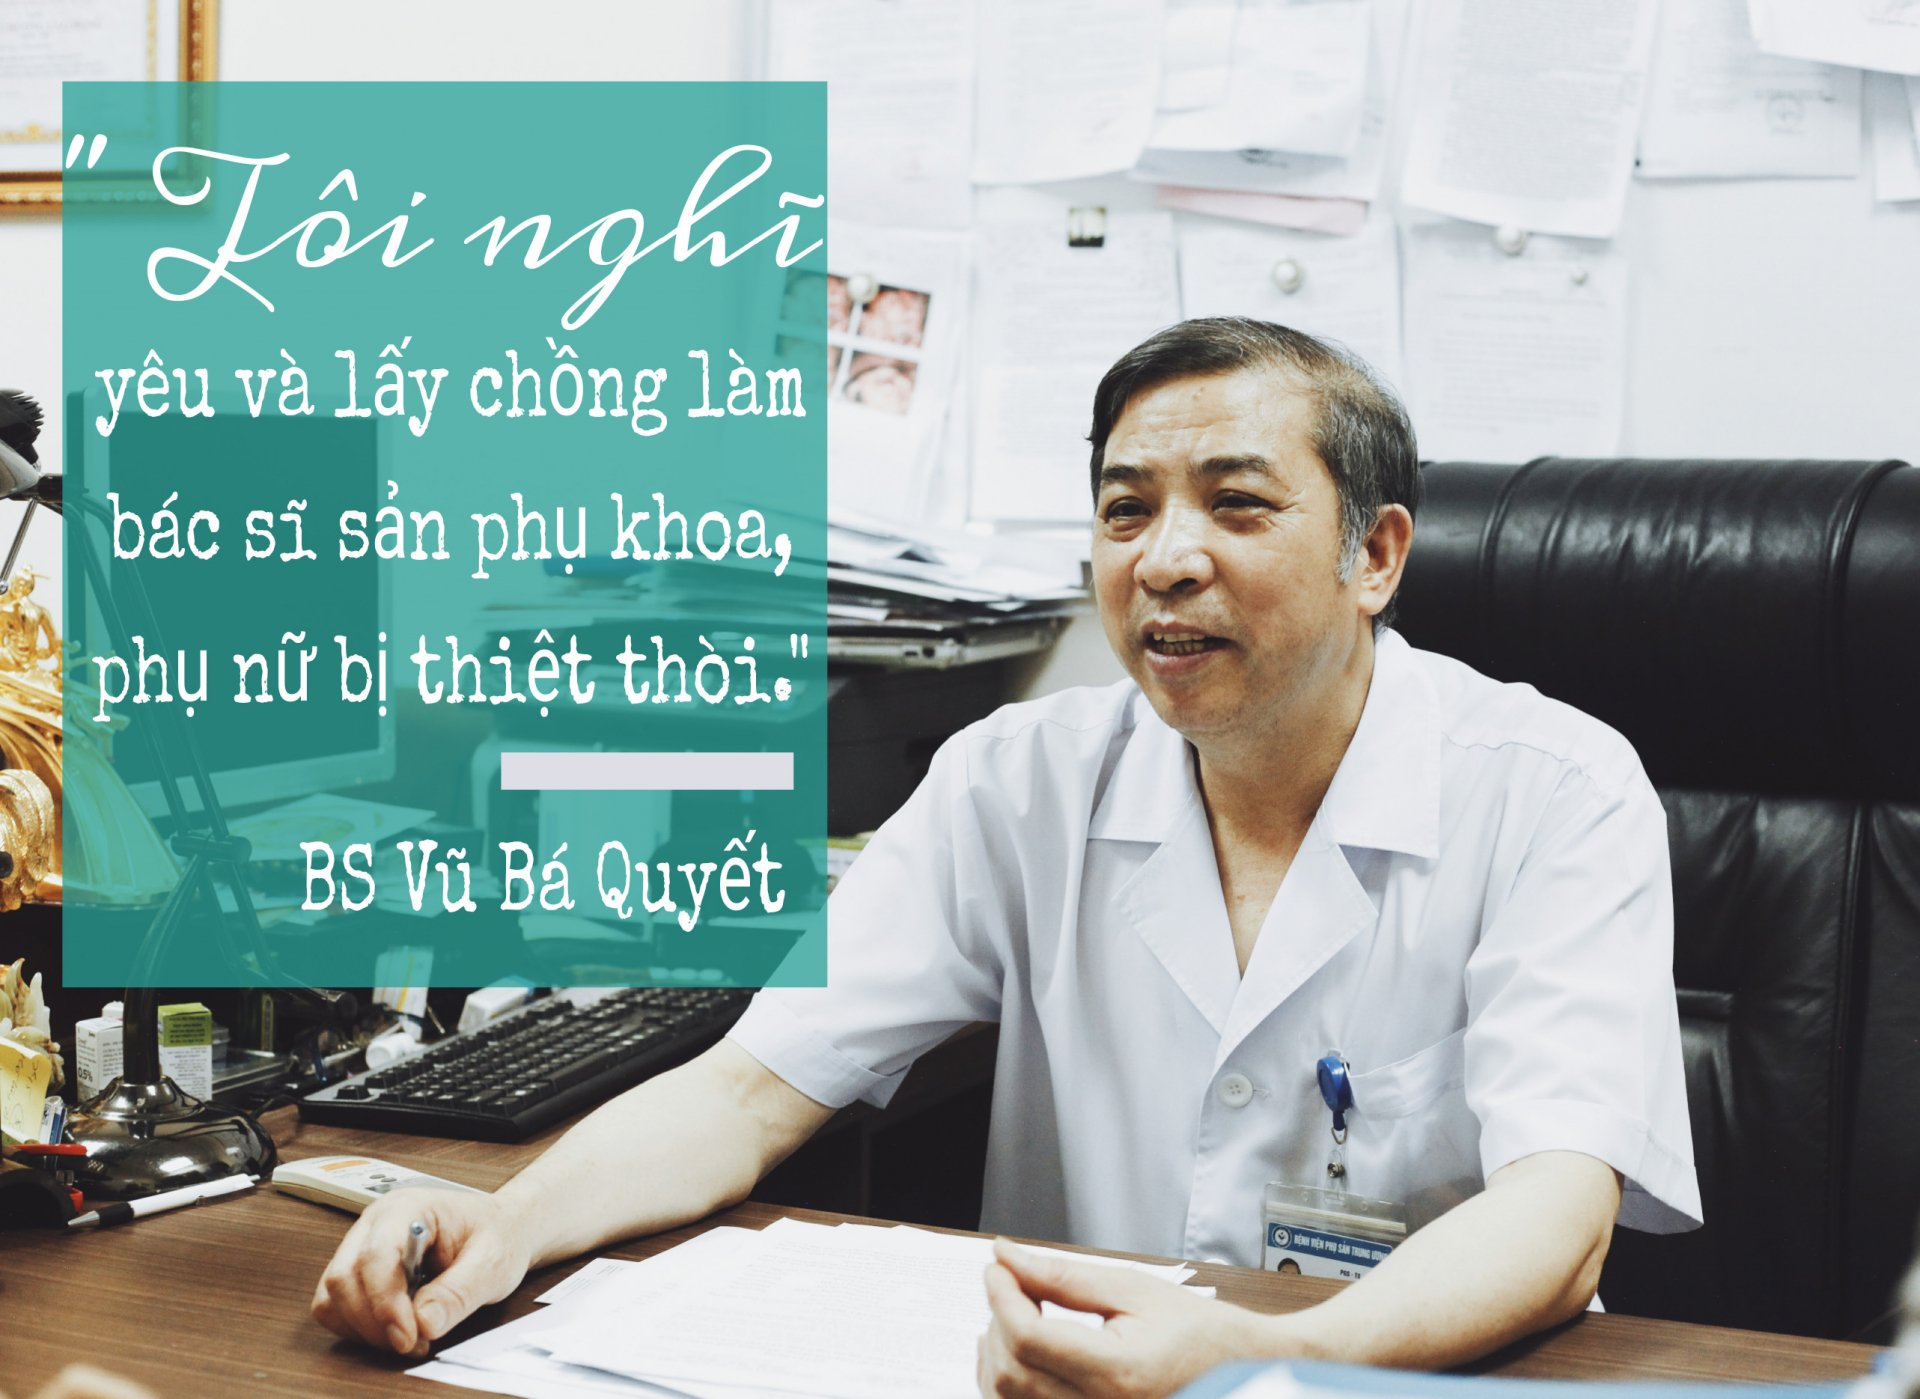 Giam doc Benh vien Phu san Trung uong bat mi hang loat chuyen 'lam dep cho phu nu' hinh anh 7